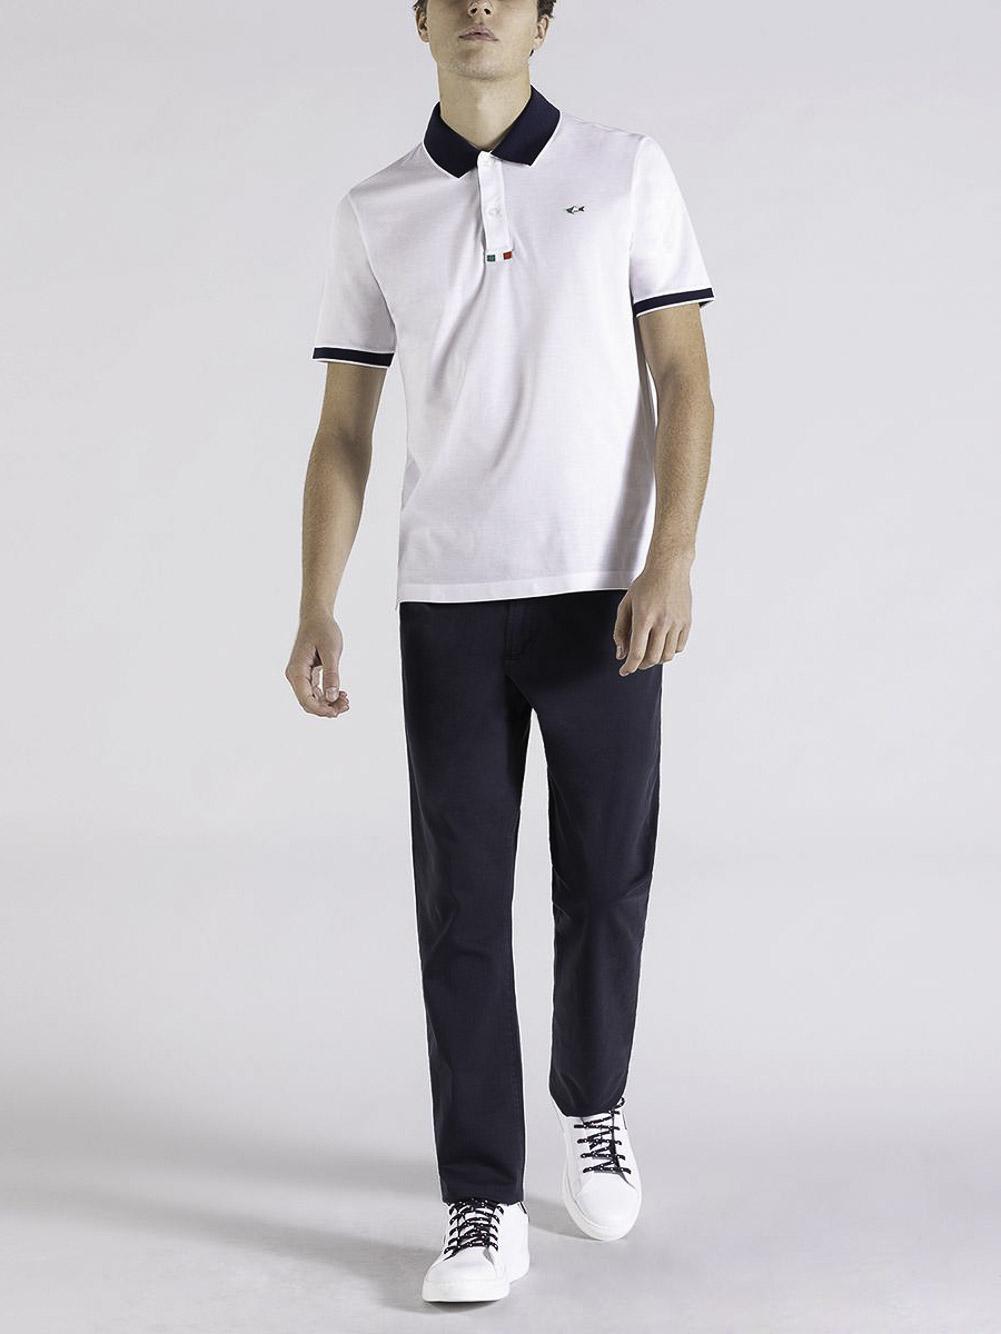 PAUL & SHARK Μπλούζα Polo 21411217-010 ΛΕΥΚΟ